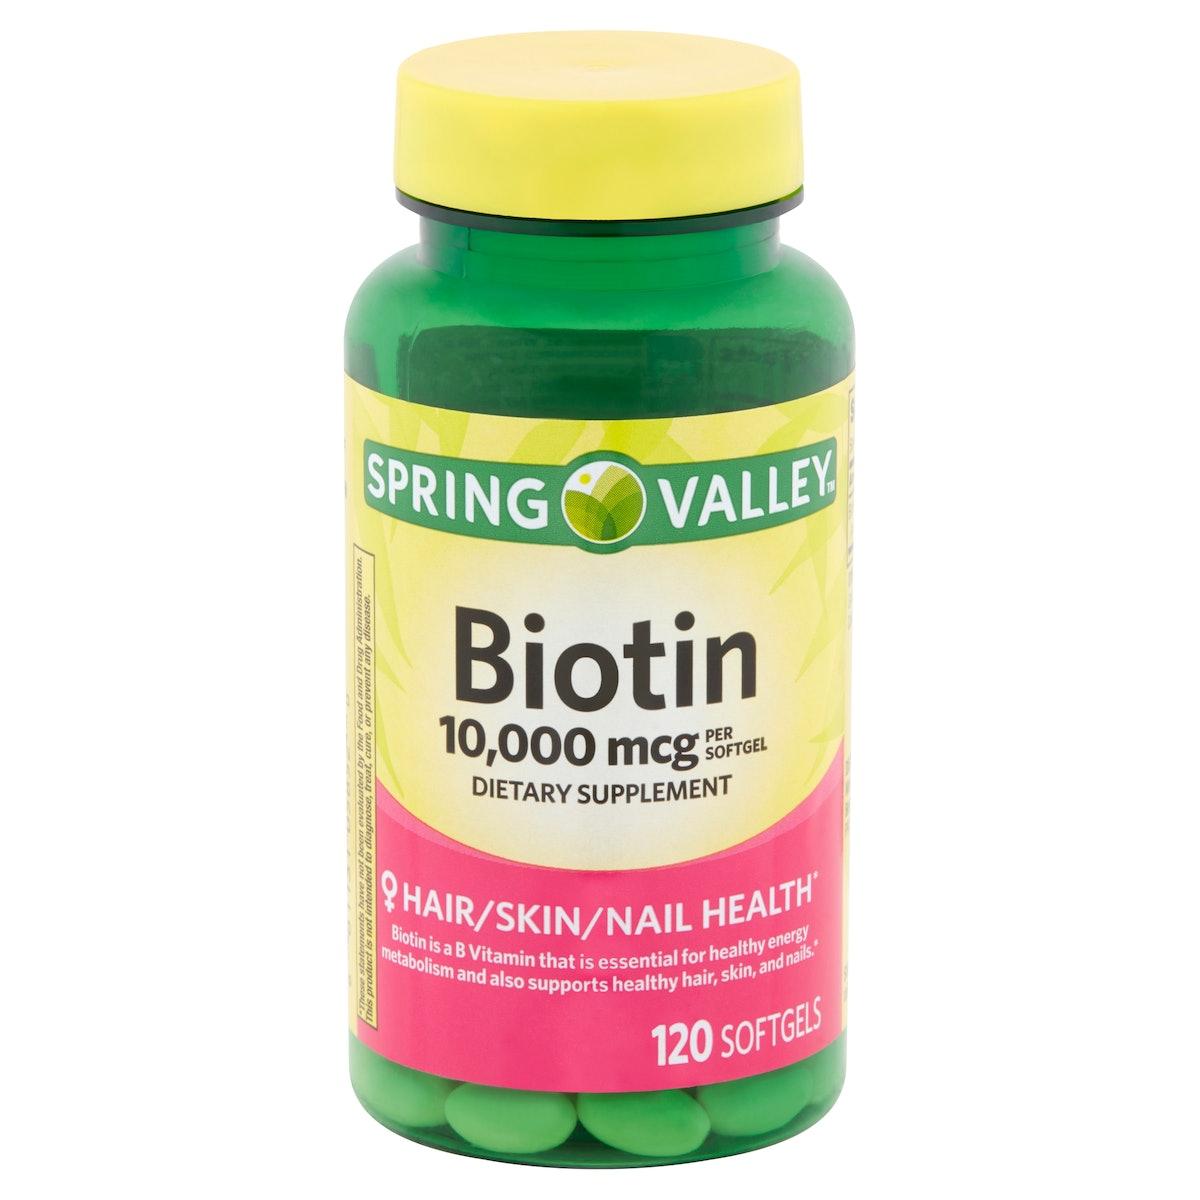 Spring Valley Biotin Softgels, 10,000 mcg, 120 count